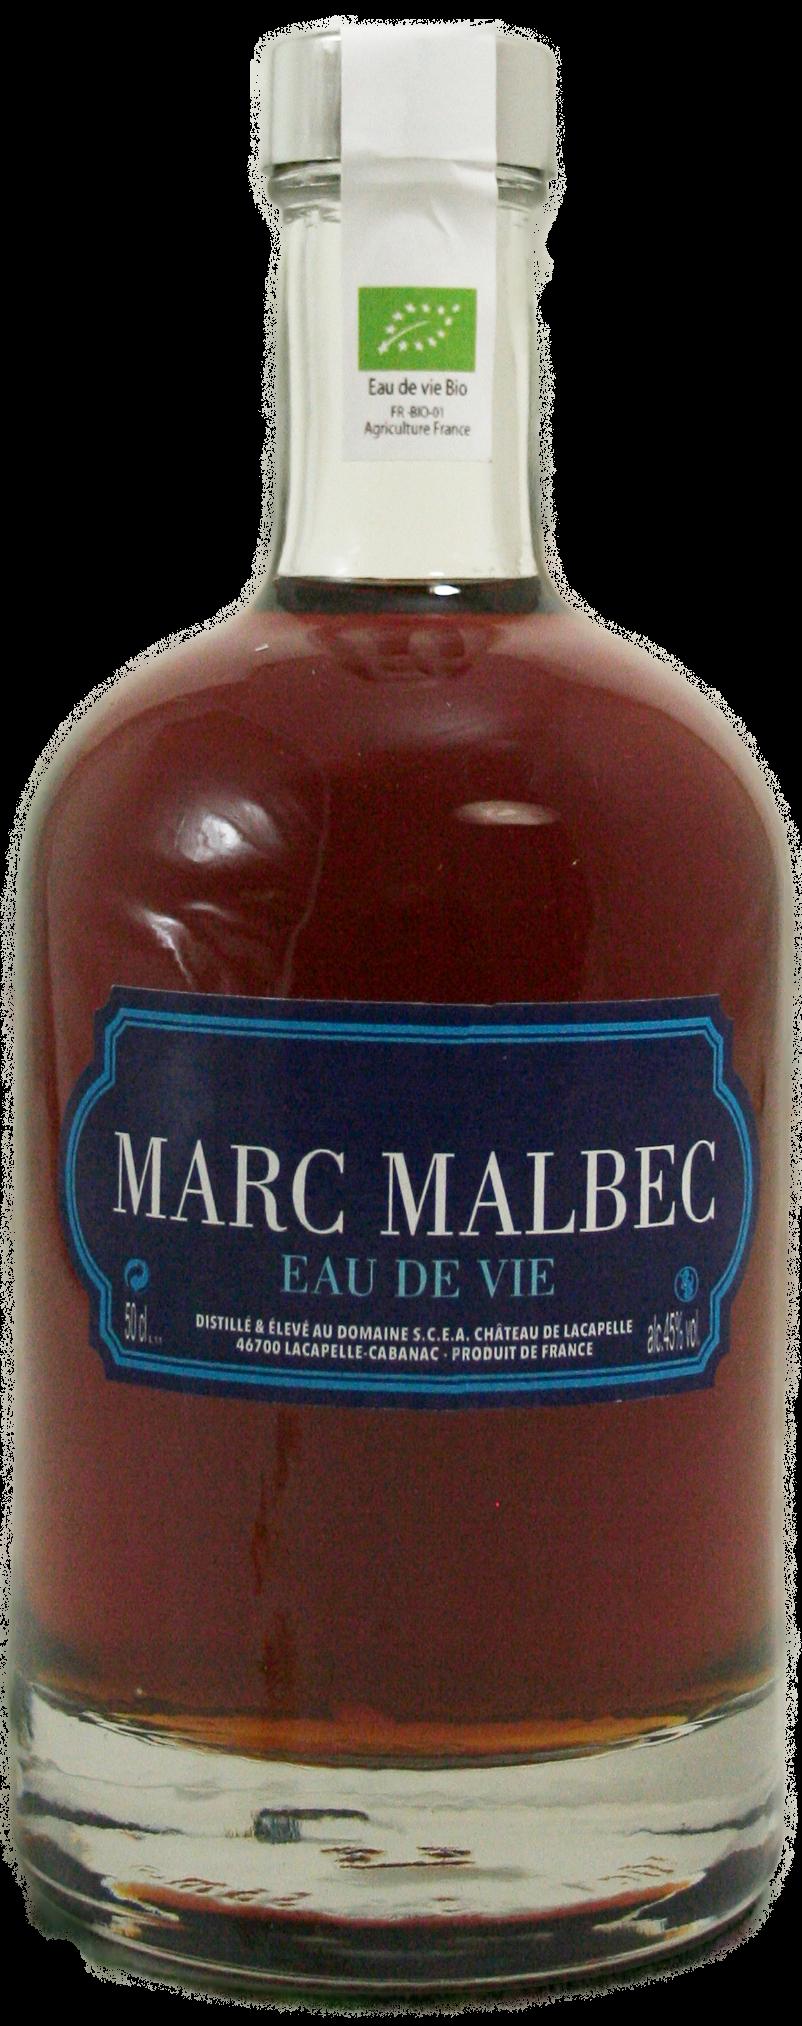 Marc Malbec